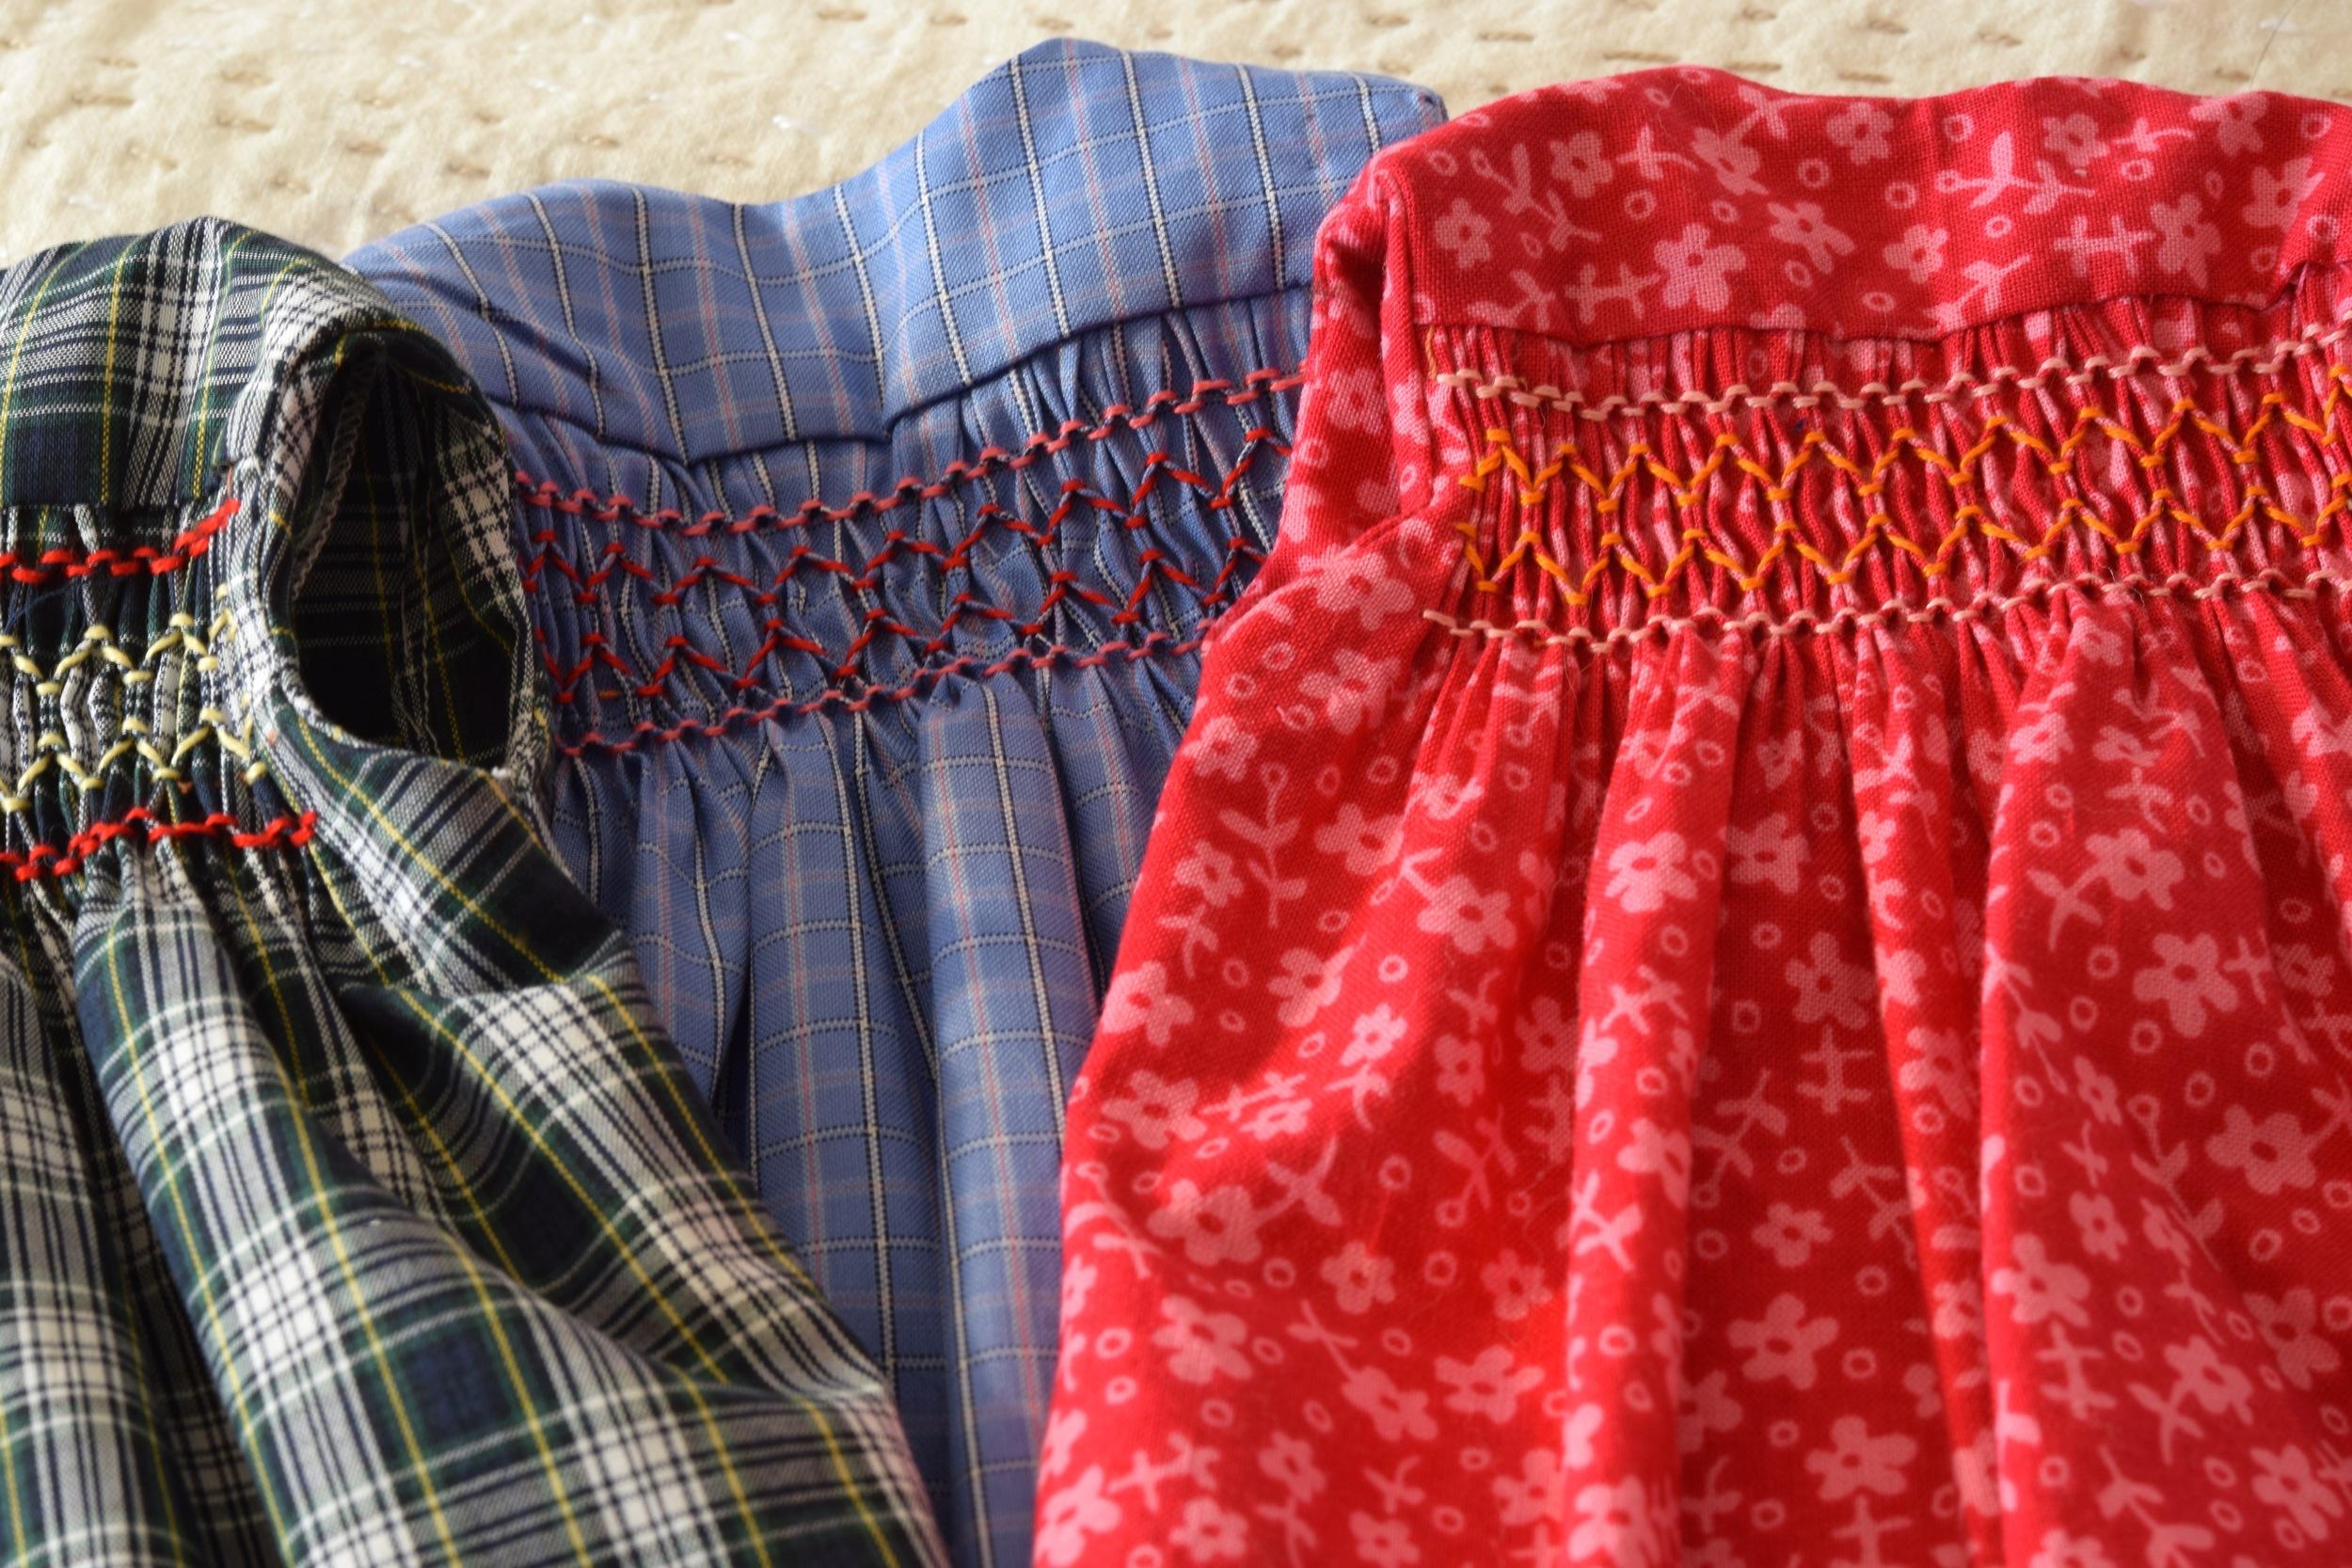 Smocked doll dress